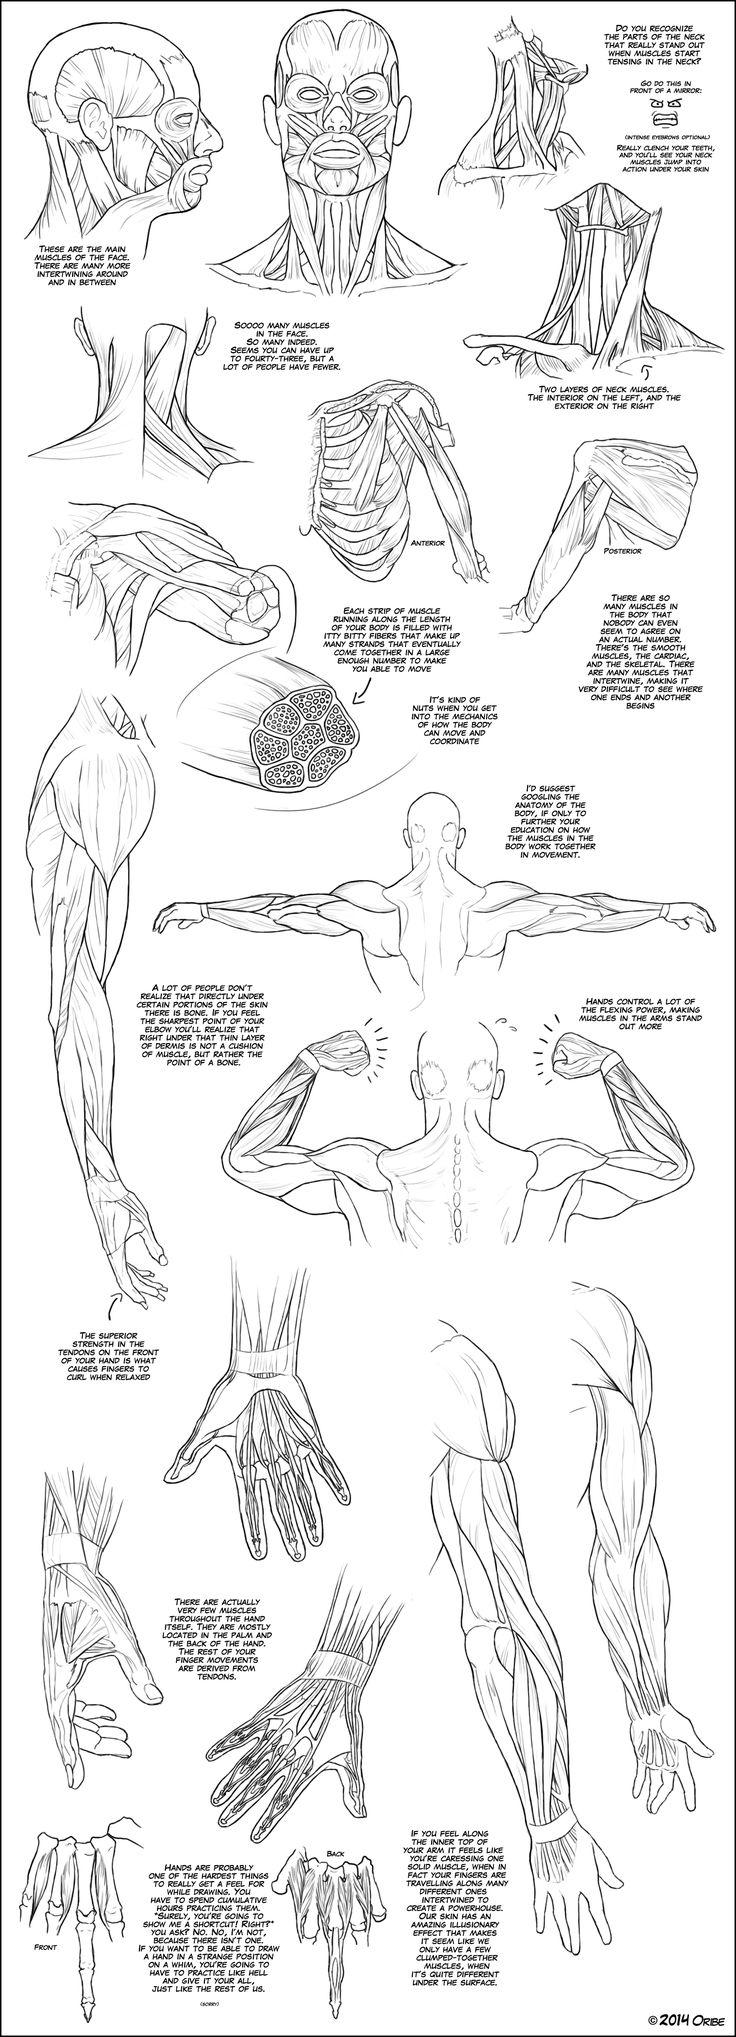 22 best anatomy images on Pinterest | Human anatomy, Anatomy male ...